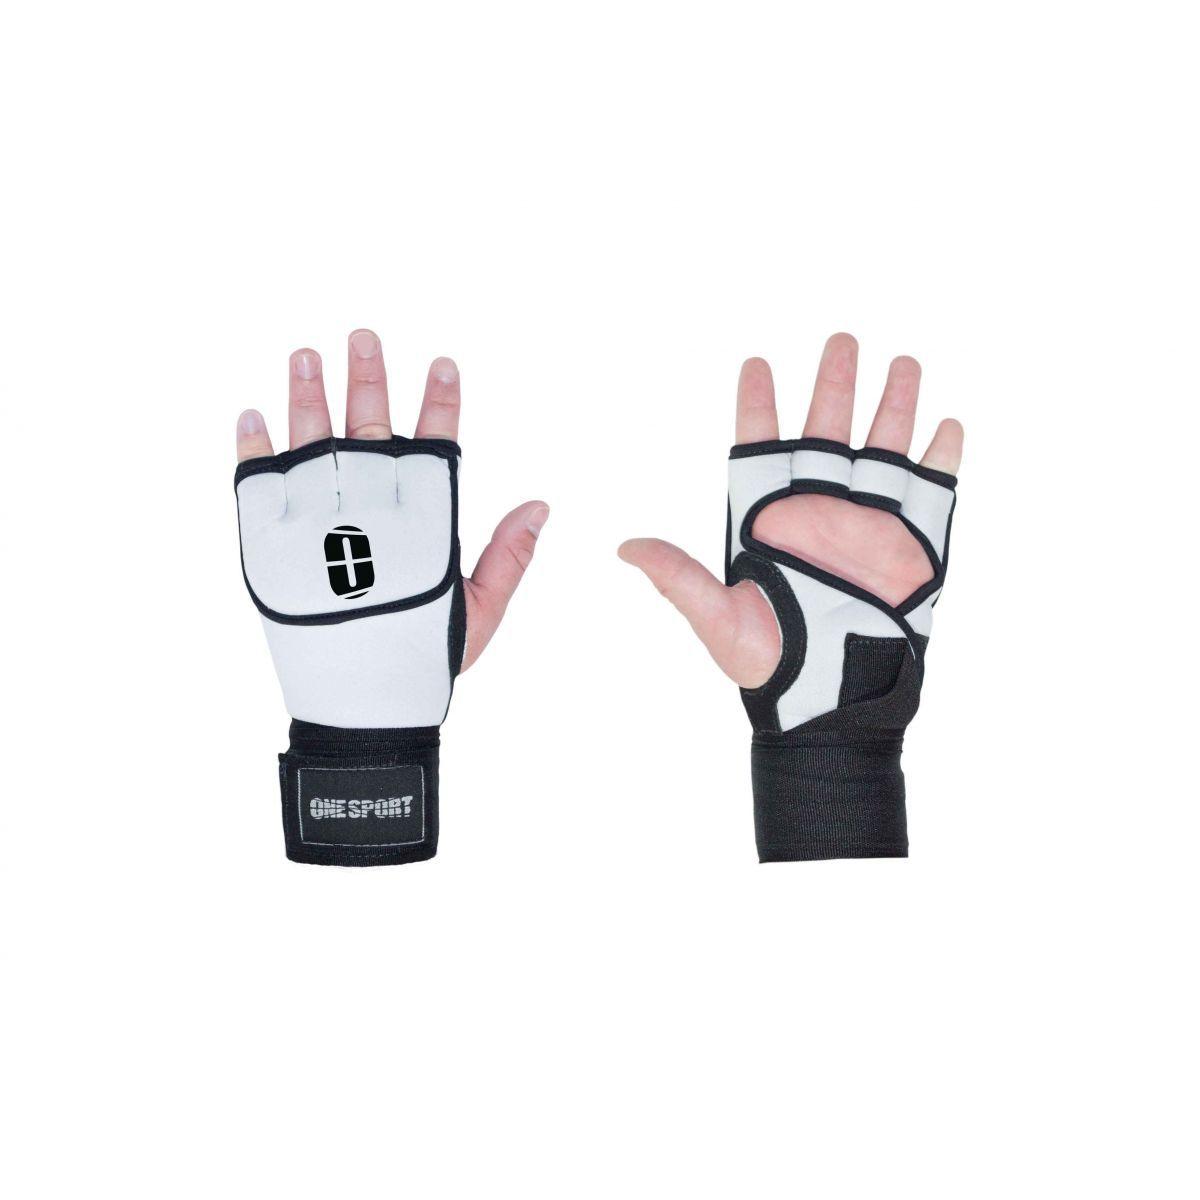 Luvas / Bandagem de Gel  - Unissex - One Sport  - Loja do Competidor